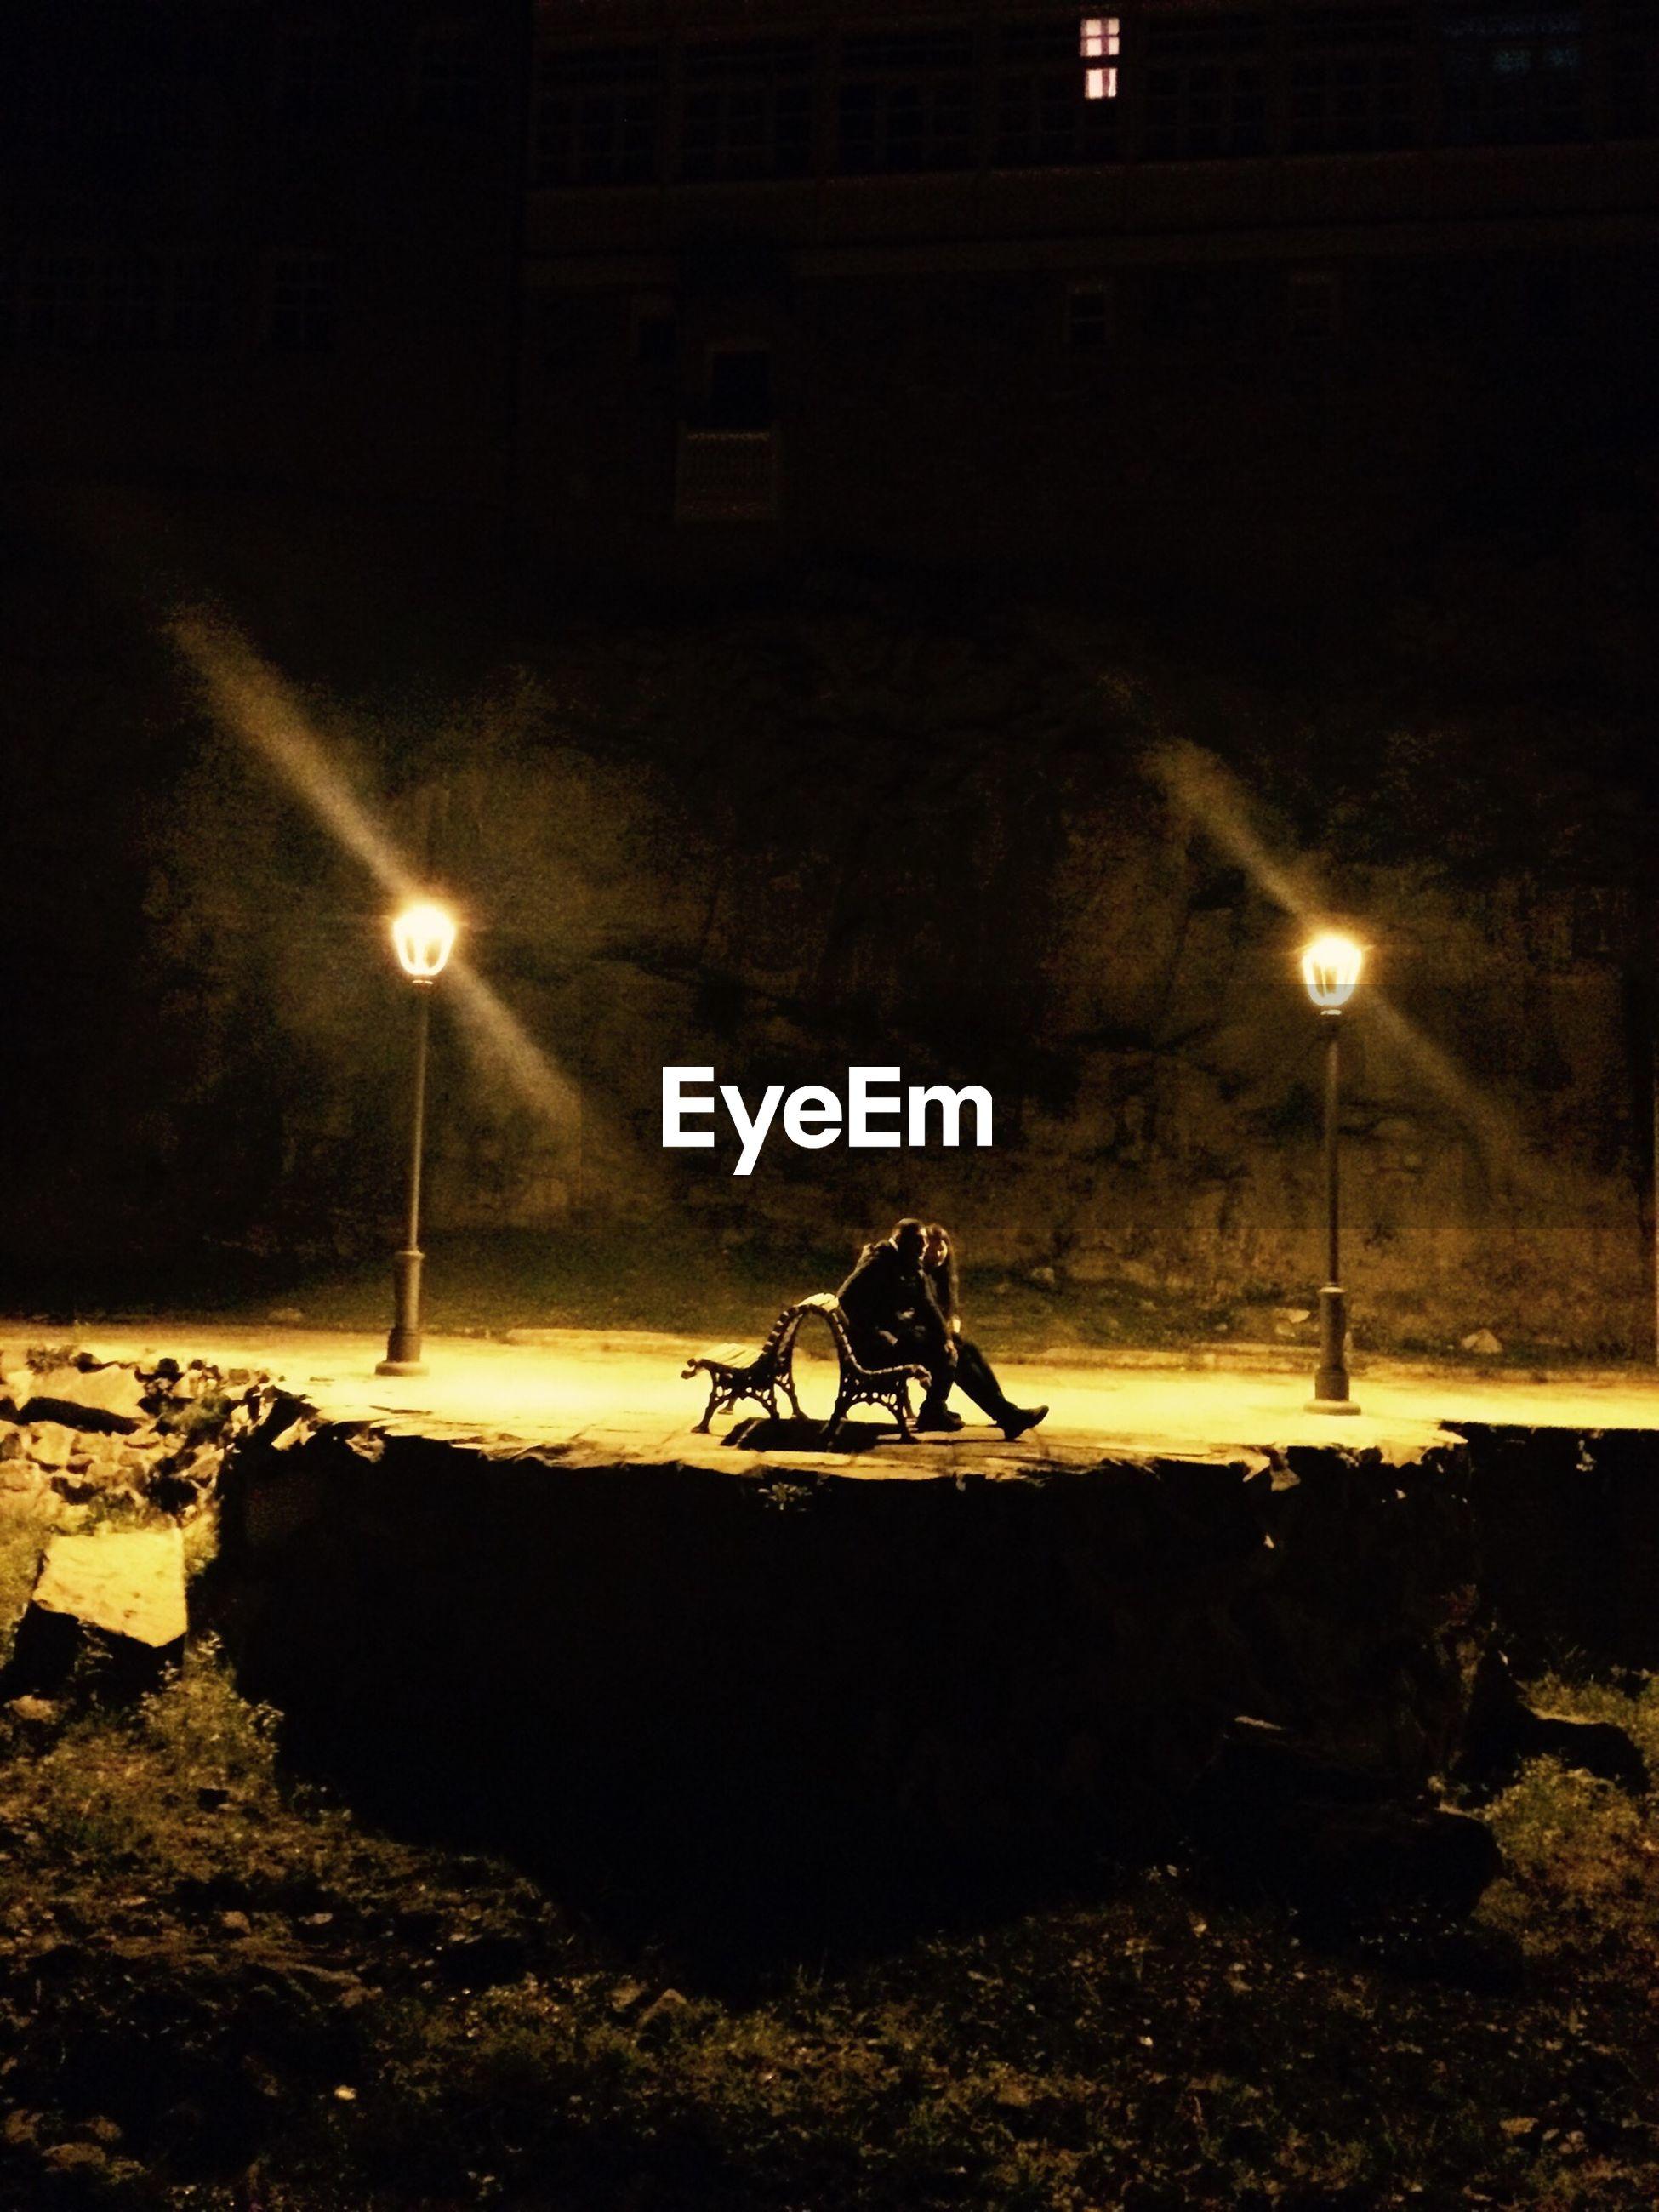 Couple sitting on bench amidst illuminated street lights at night